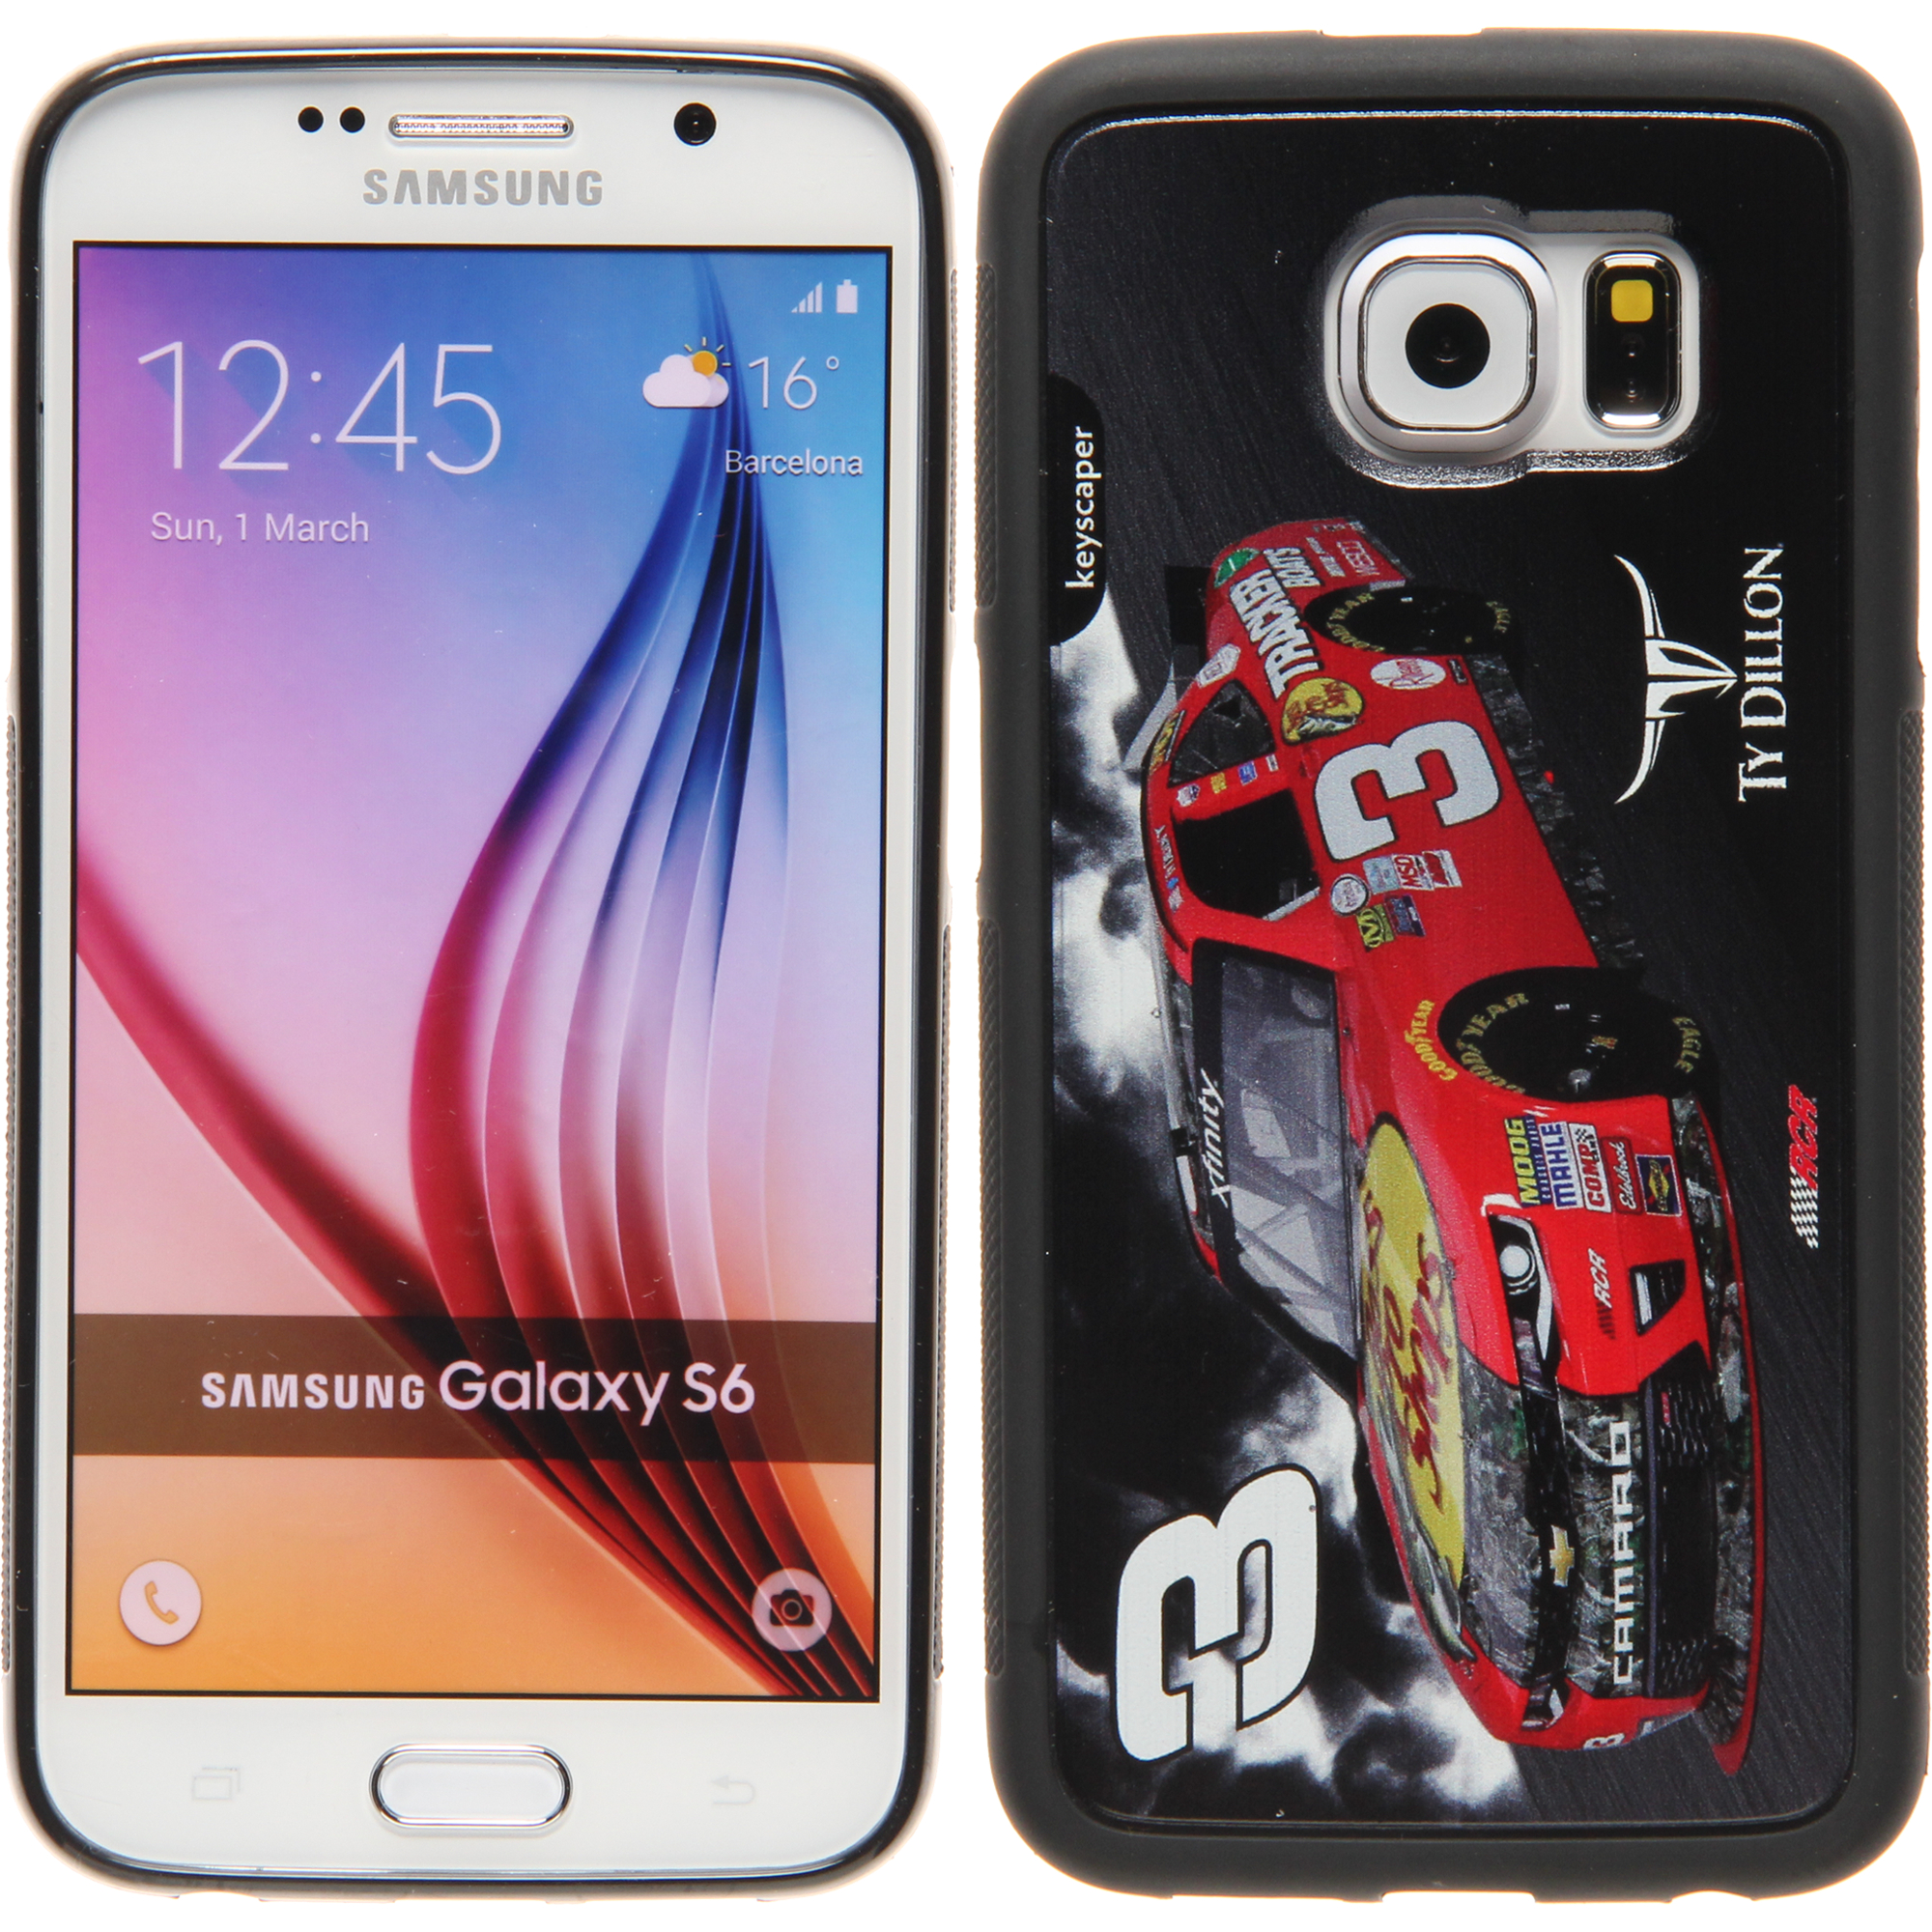 Ty Dillon 3 Bass Pro Shops Samsung Galaxy S6 Bumper Case by Keyscaper